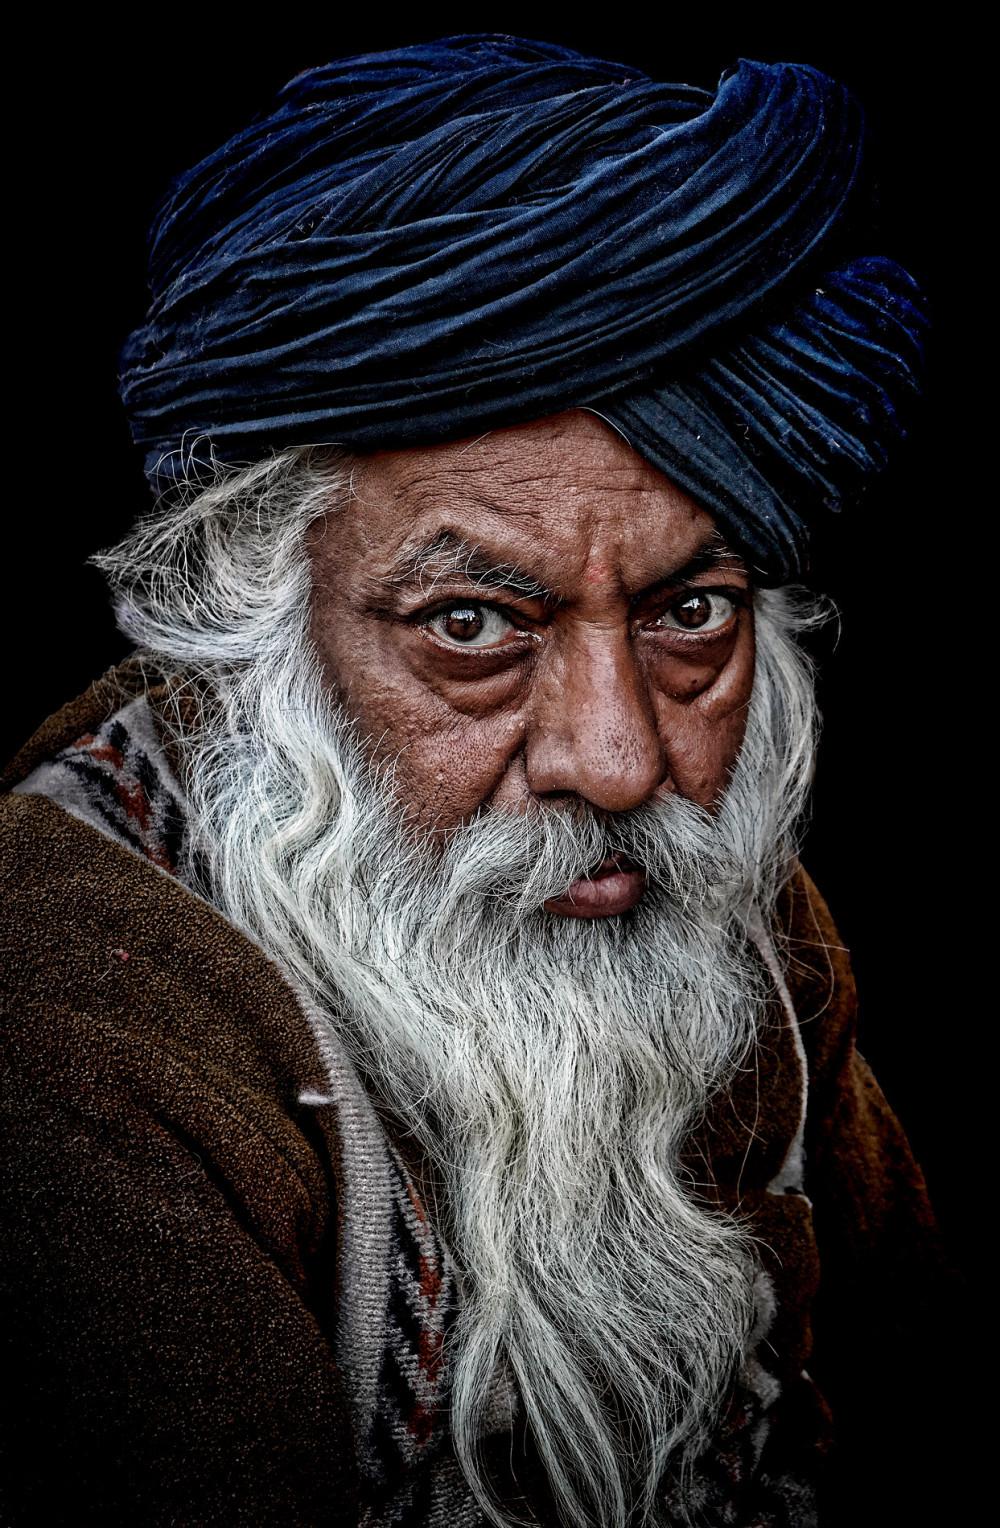 sikh turban man merchant white beard merchant